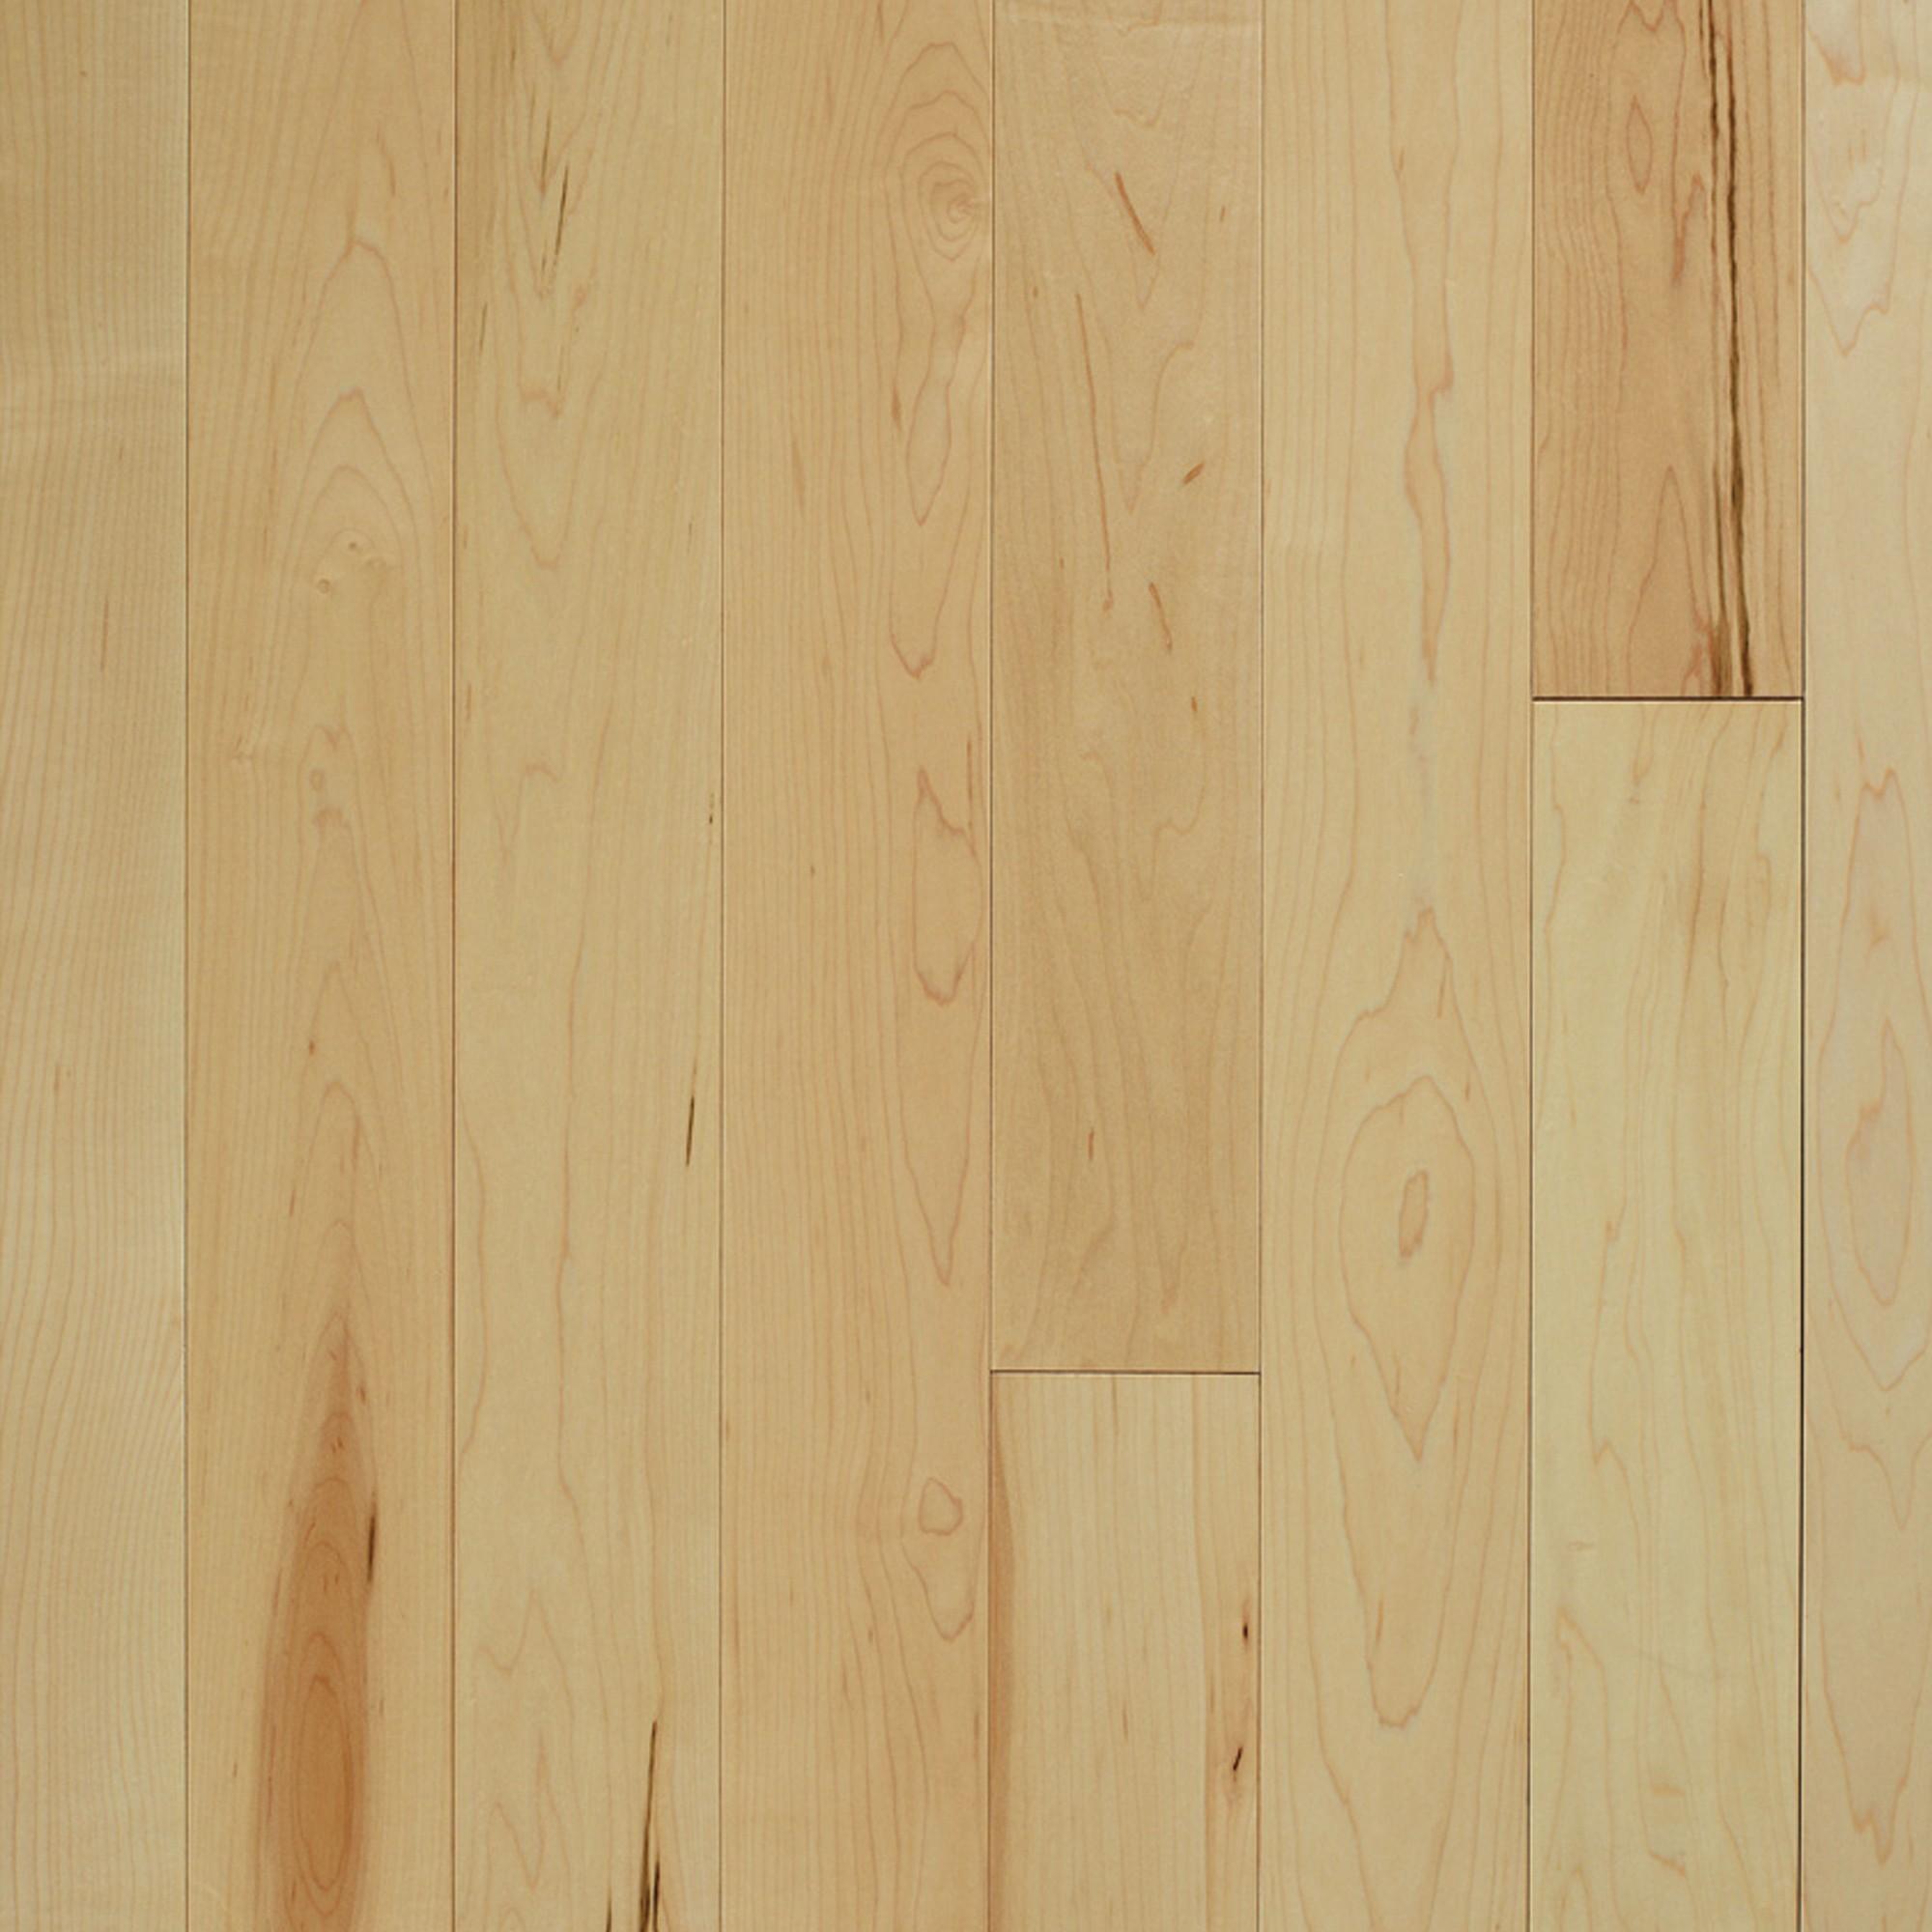 Smooth Maple Natural Vintage Hardwood Flooring And